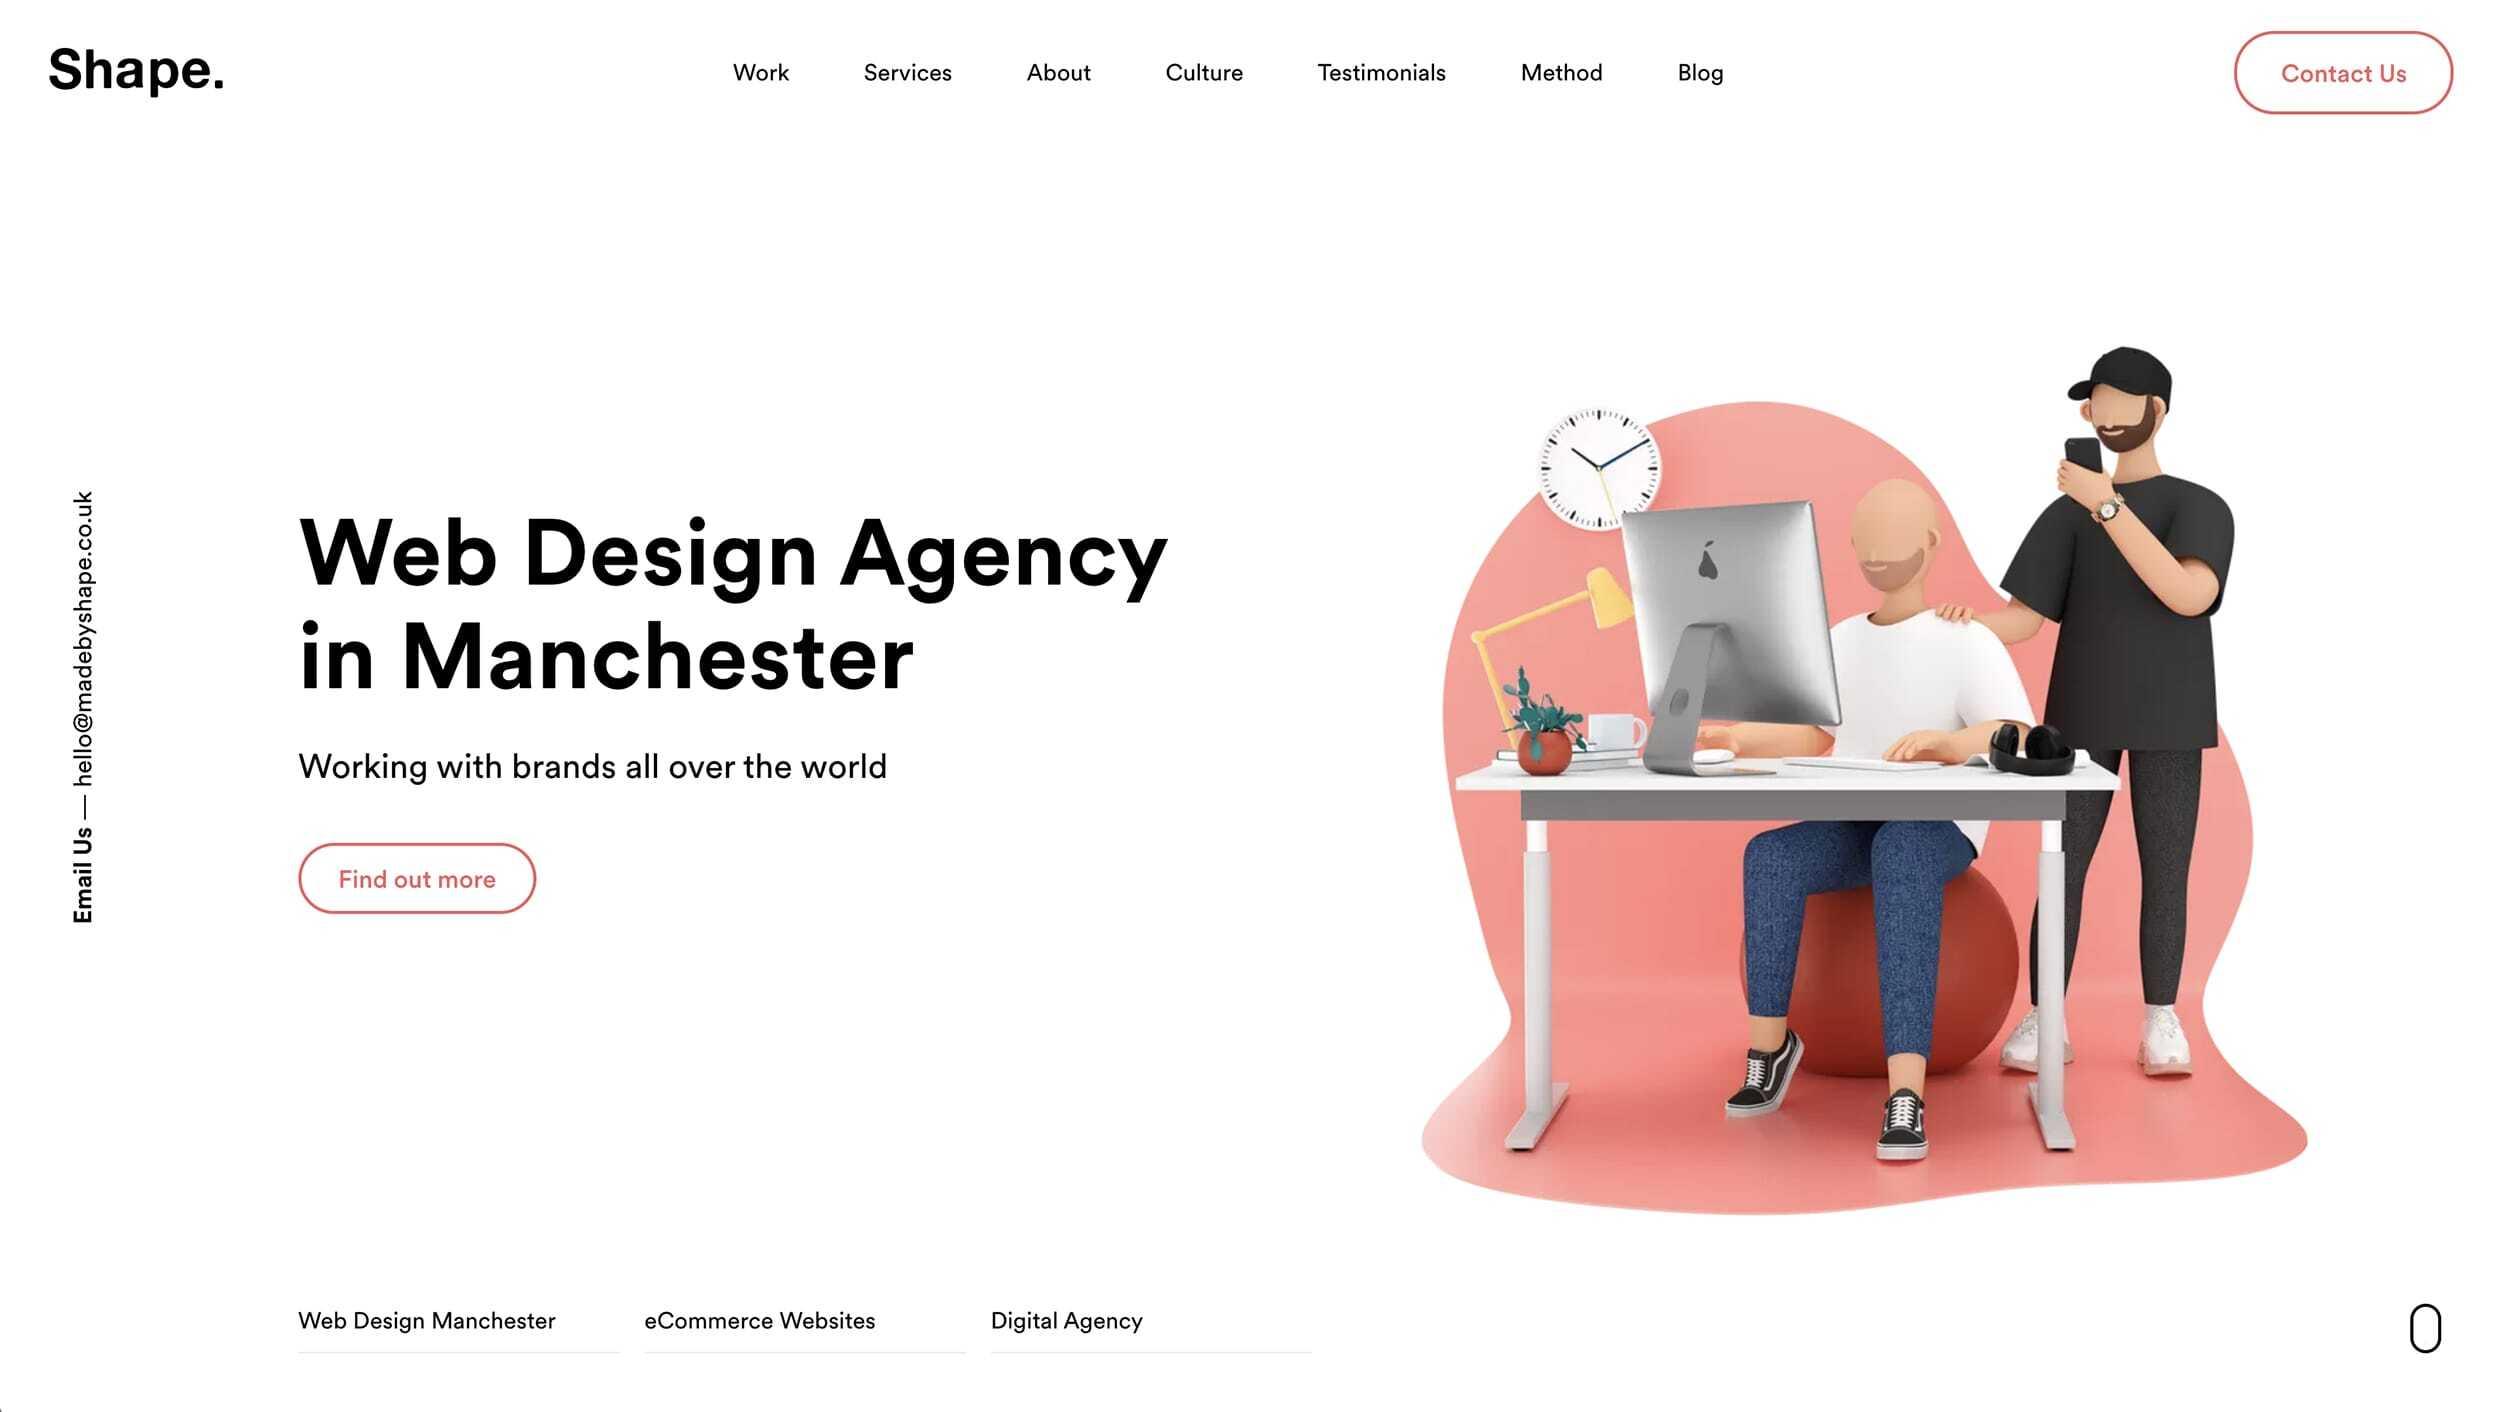 MadeByShape Website Landing Page